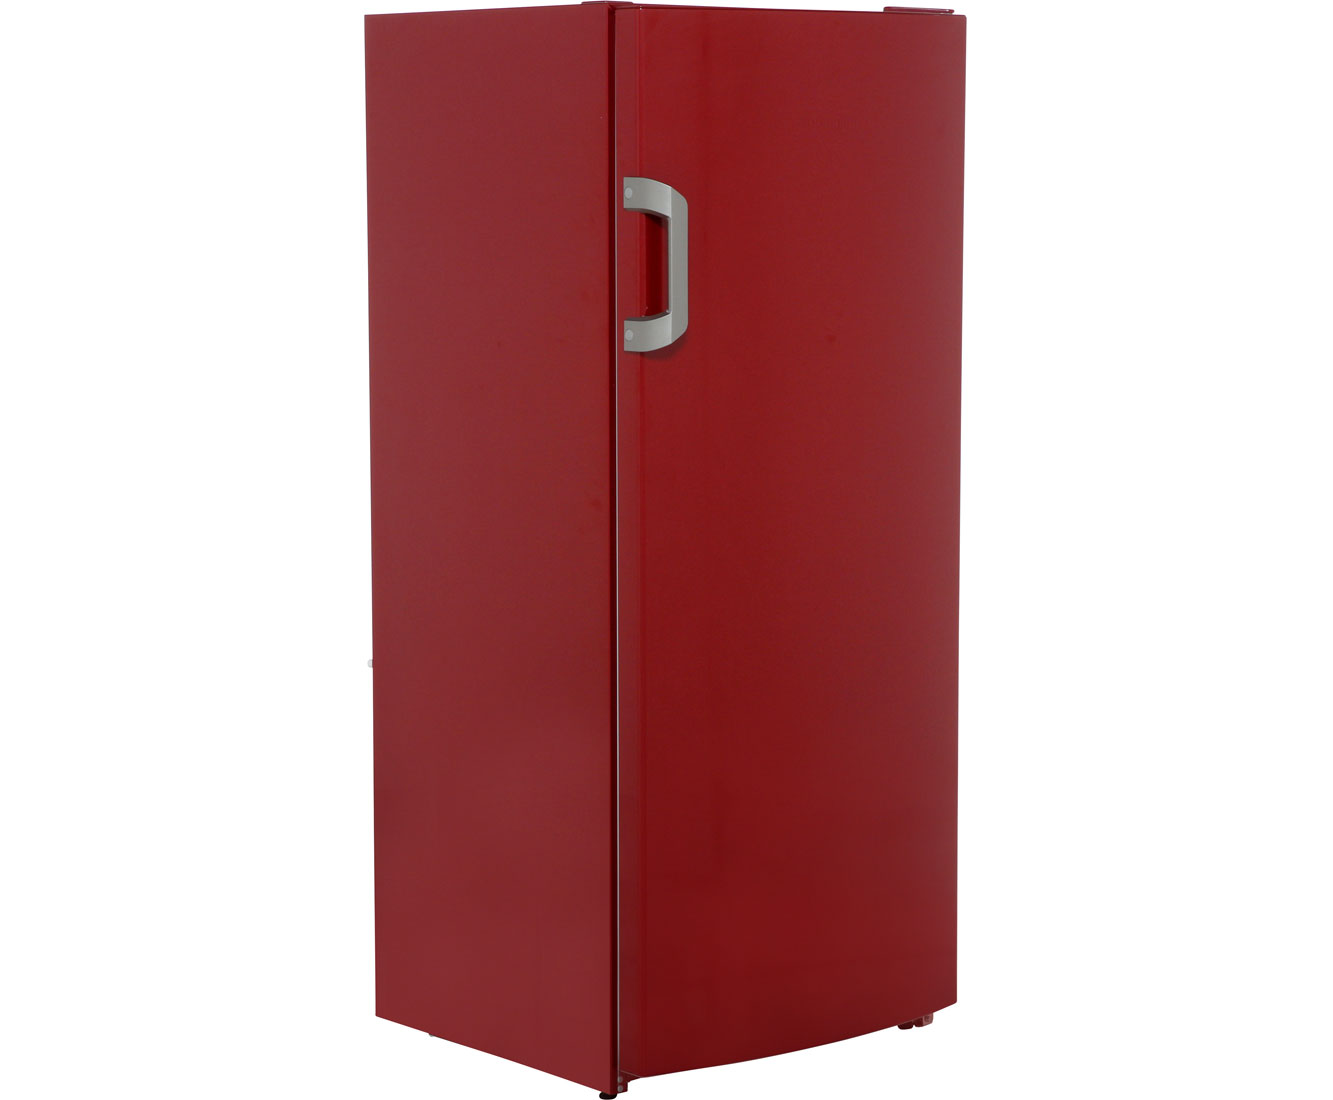 Gorenje Kühlschrank Freistehend : Gorenje r brd kühlschrank rot a